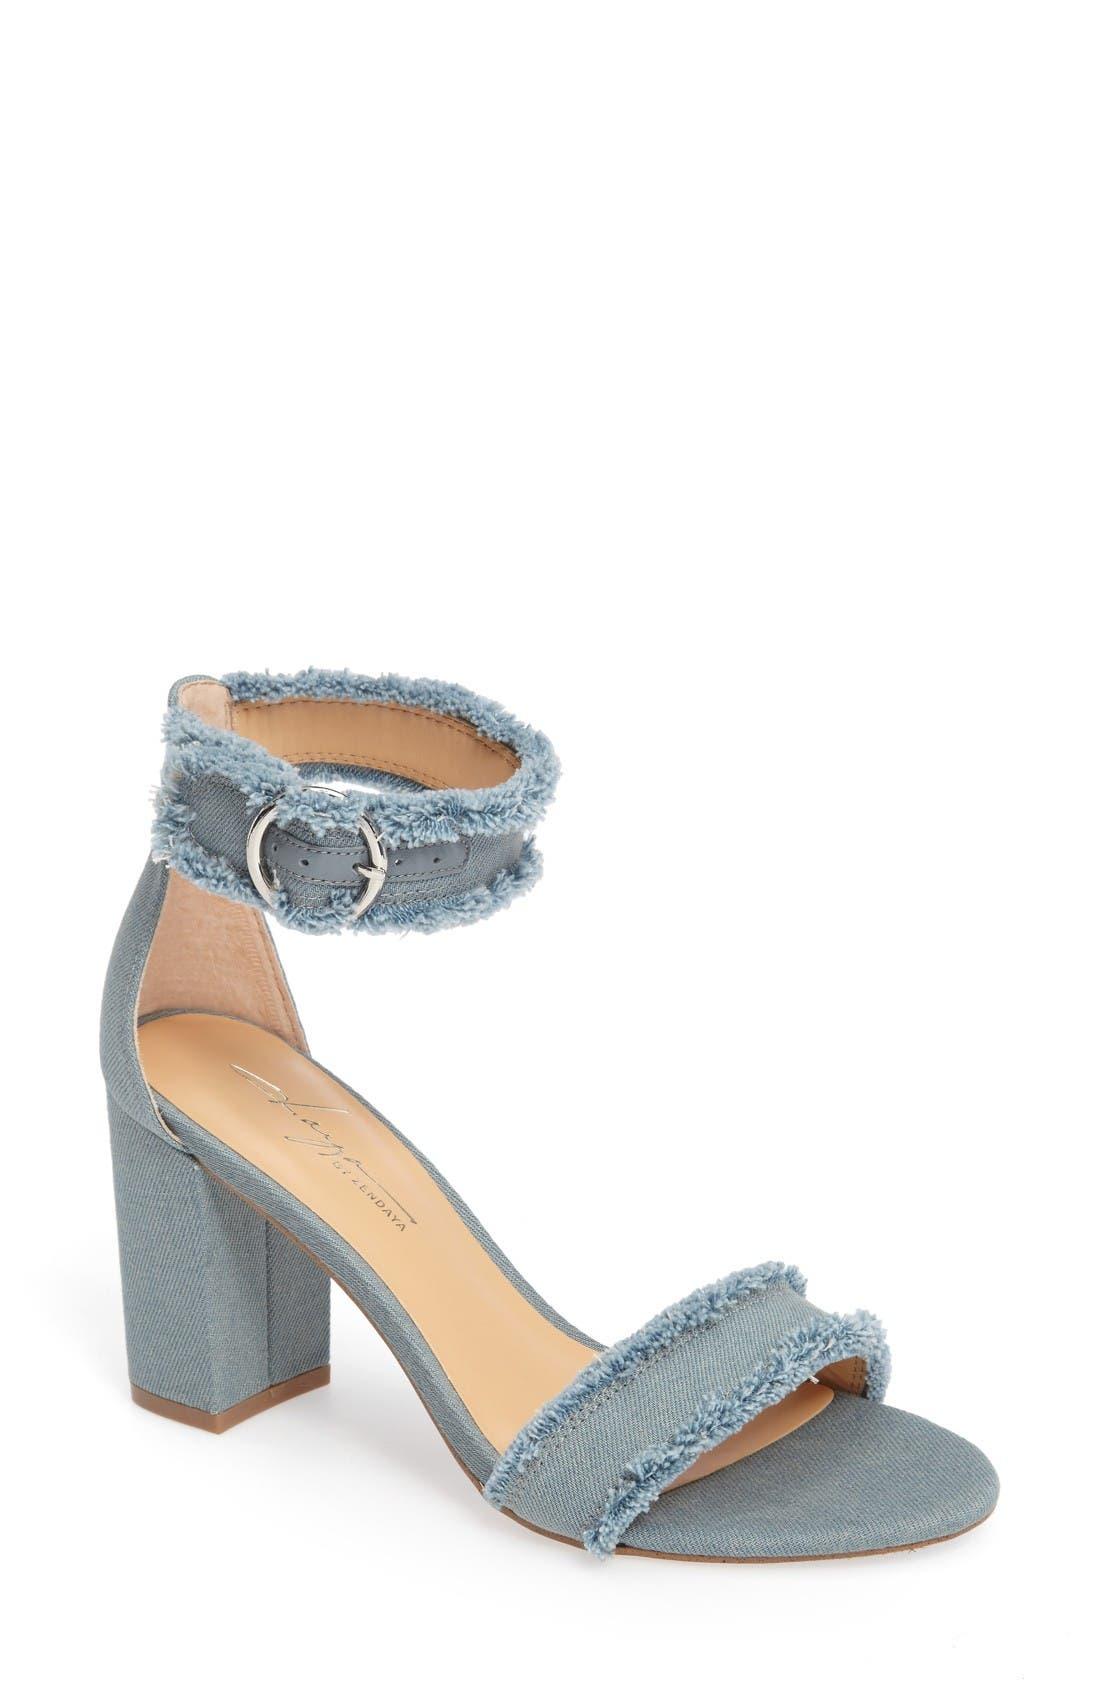 Main Image - Daya by Zendaya Shasta Fringe Denim Ankle Strap Sandal (Women)